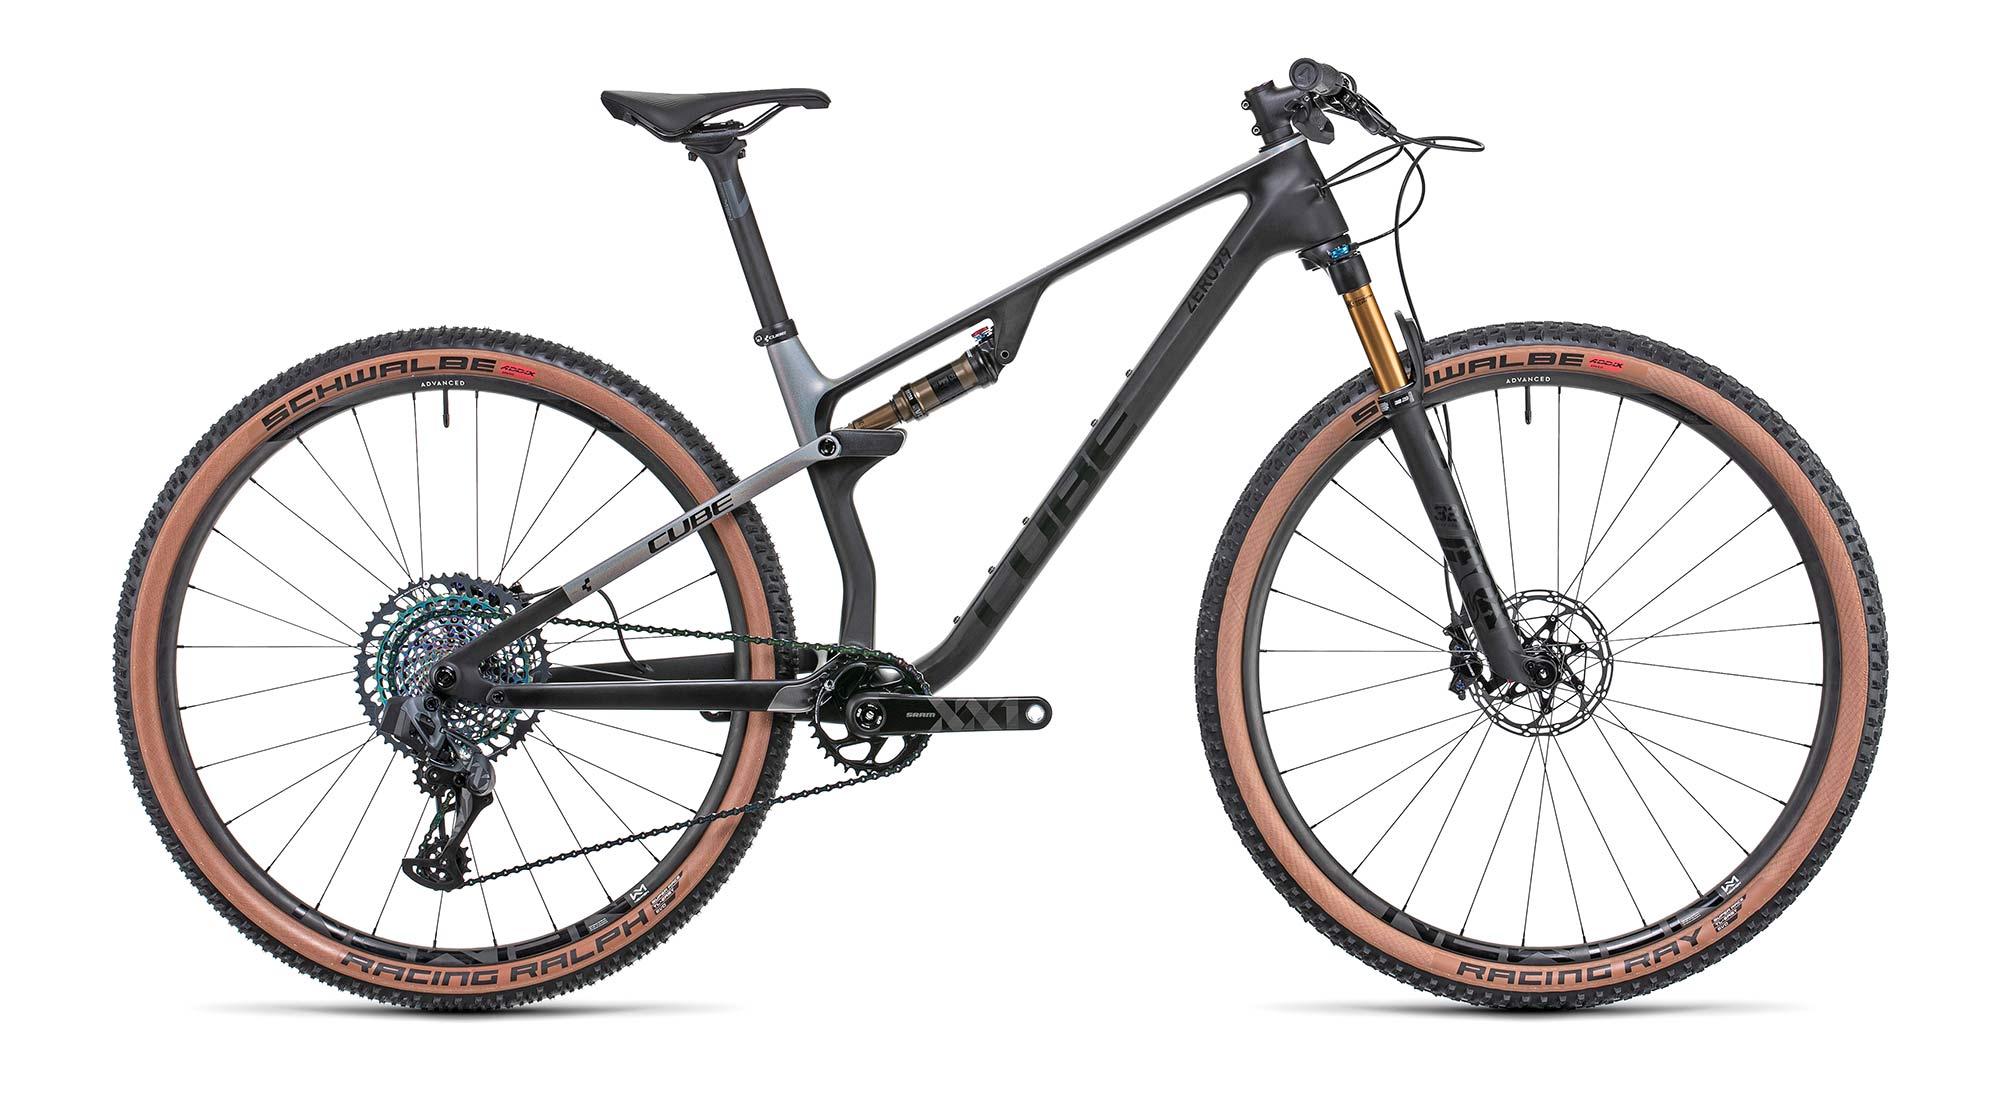 2022 Cube AMS Zero99 C:68X 29, lightweight carbon XC Marathon Trail mountain bike,SLT complete